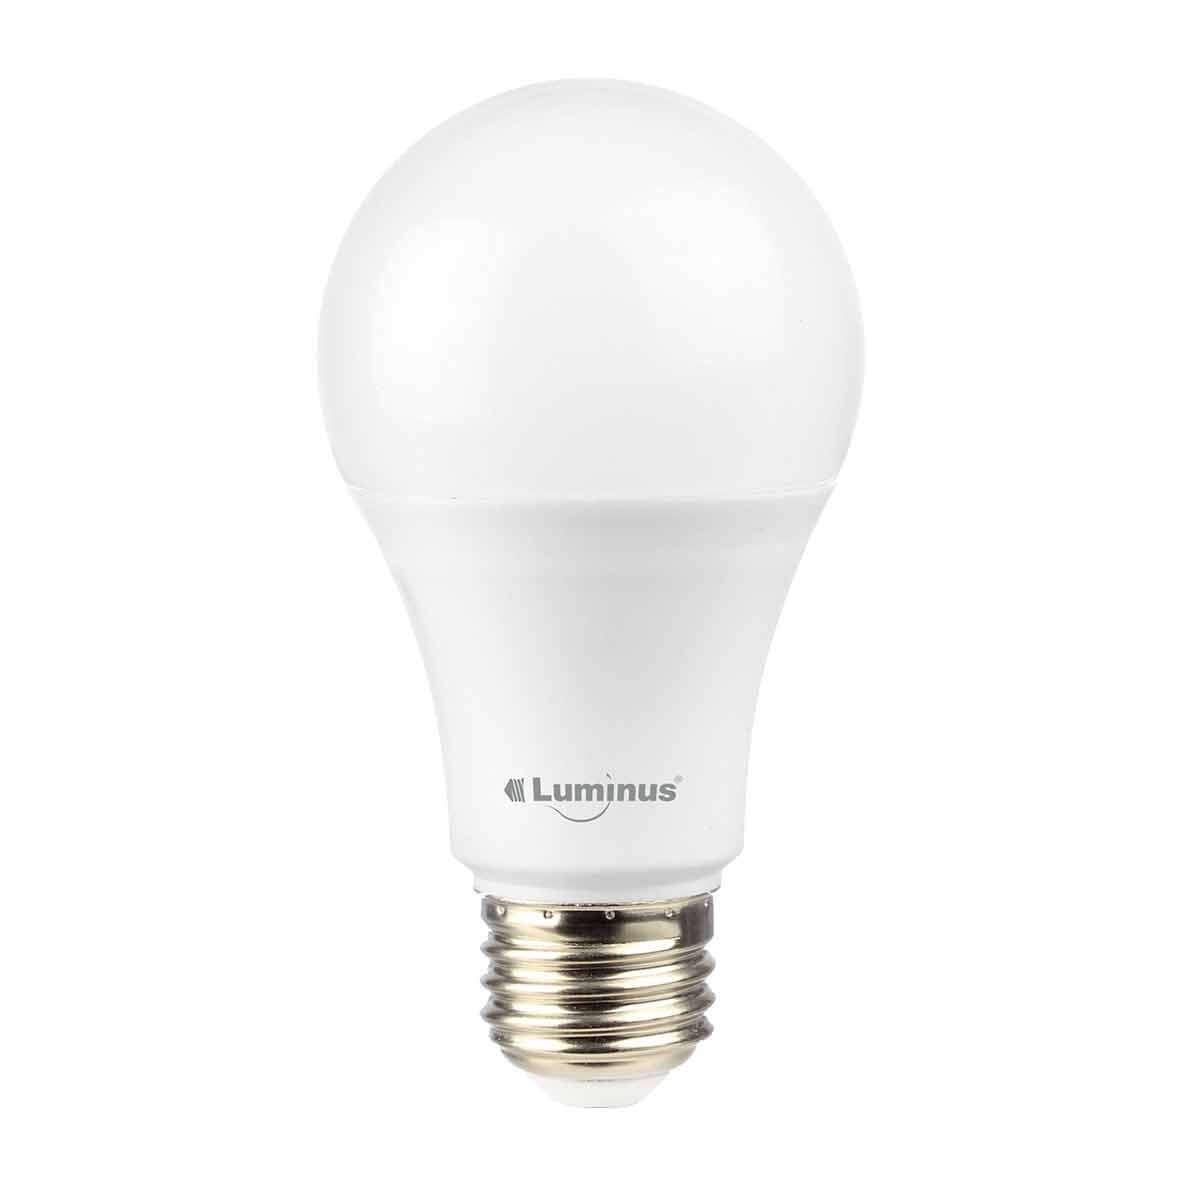 Luminus LED Light Bulbs - 2 Pack